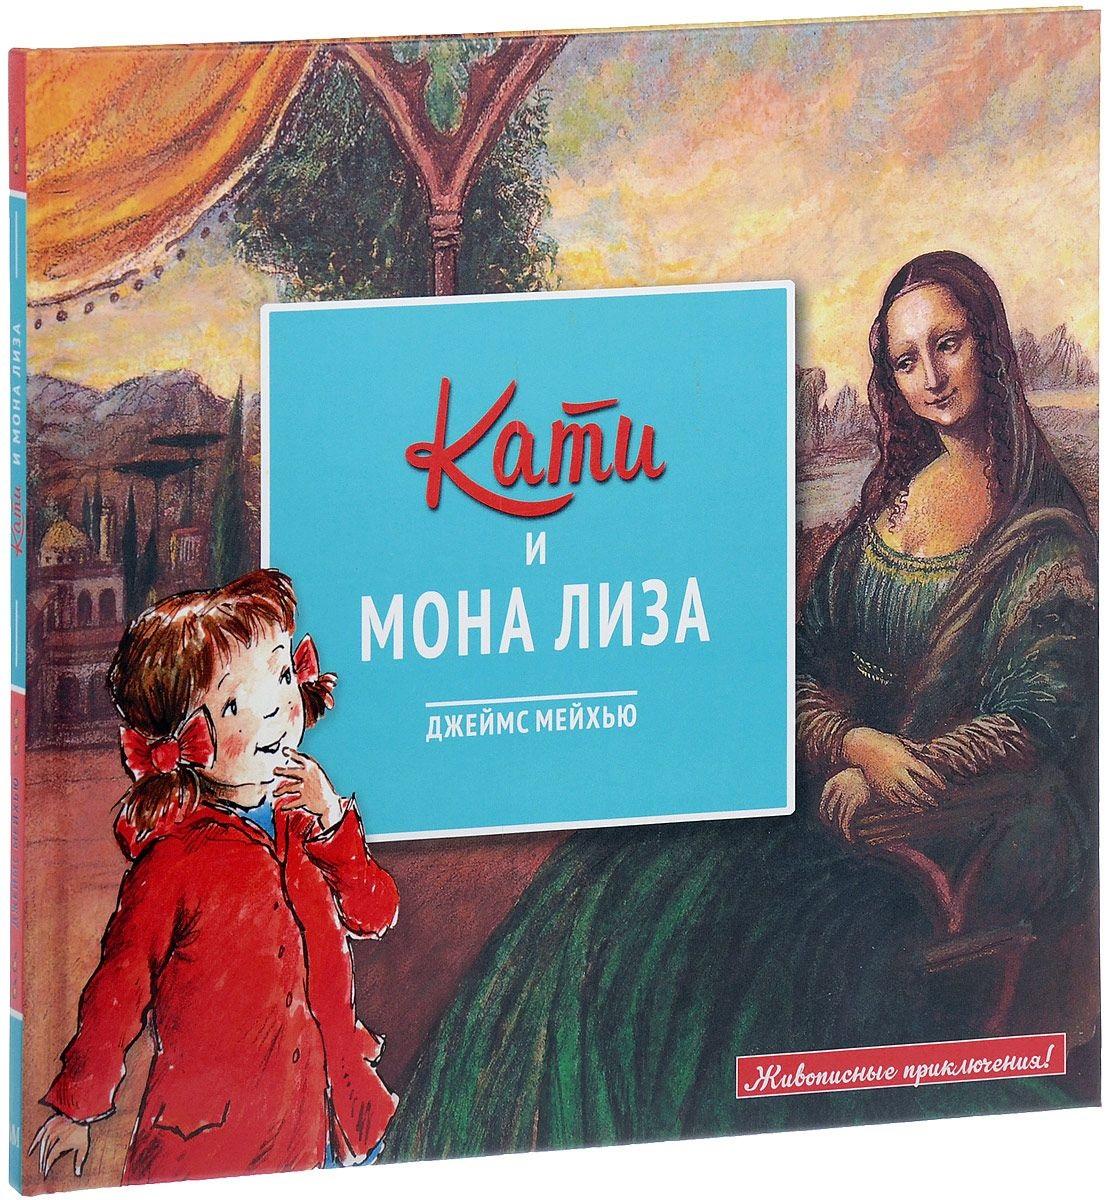 Мейхью Дж. Кати и Мона Лиза мейхью джеймс кати в картинной галерее